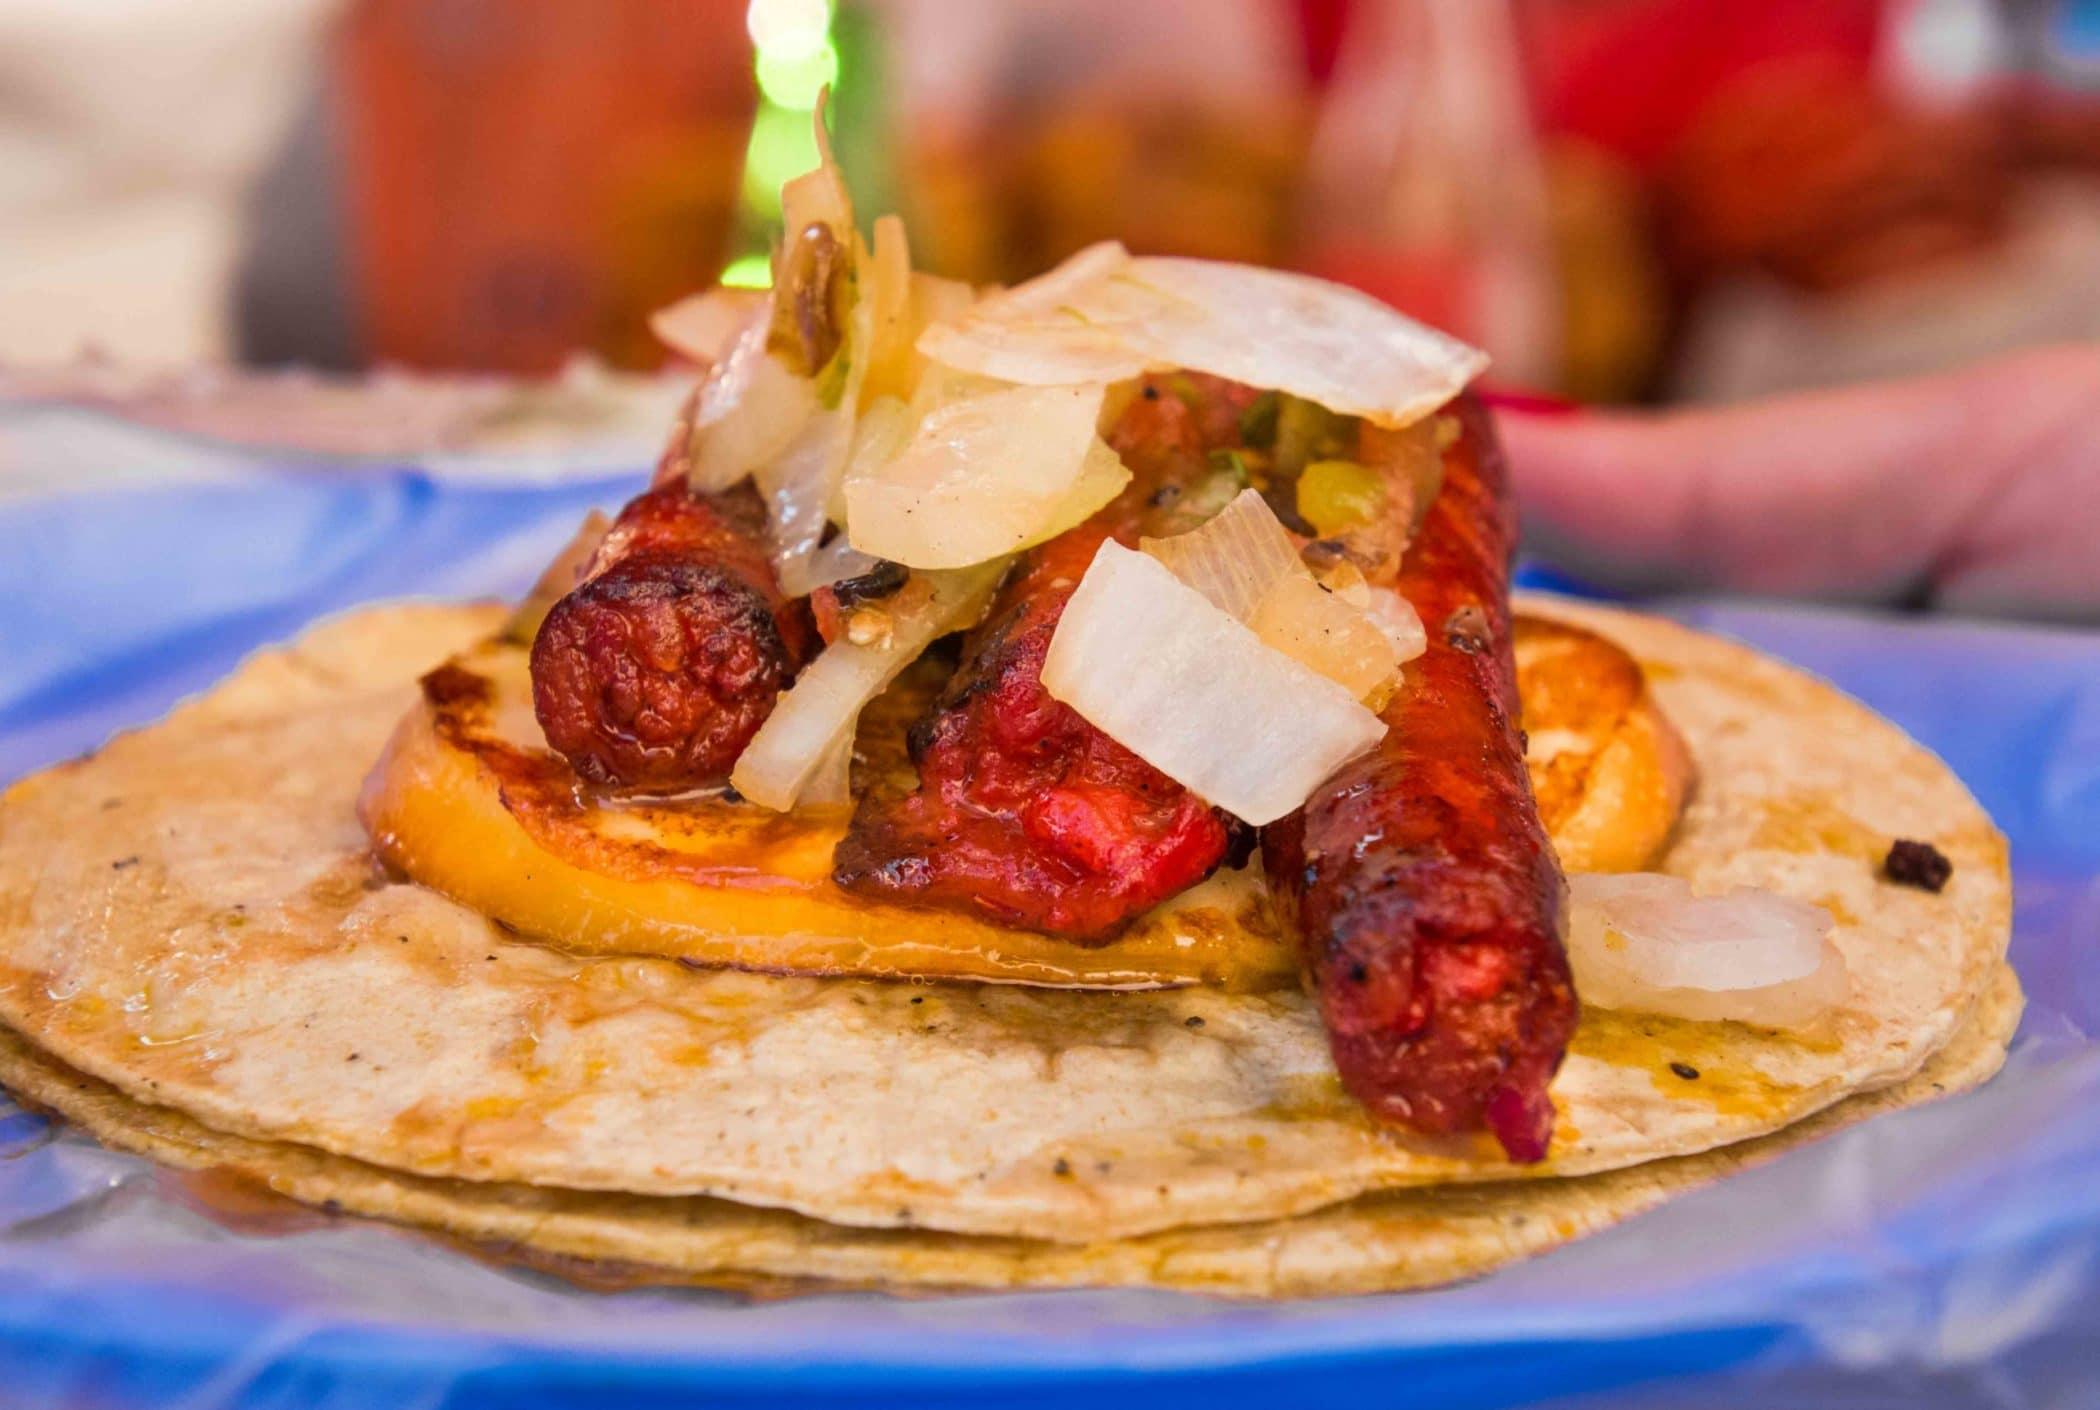 Tacos in Mexico City